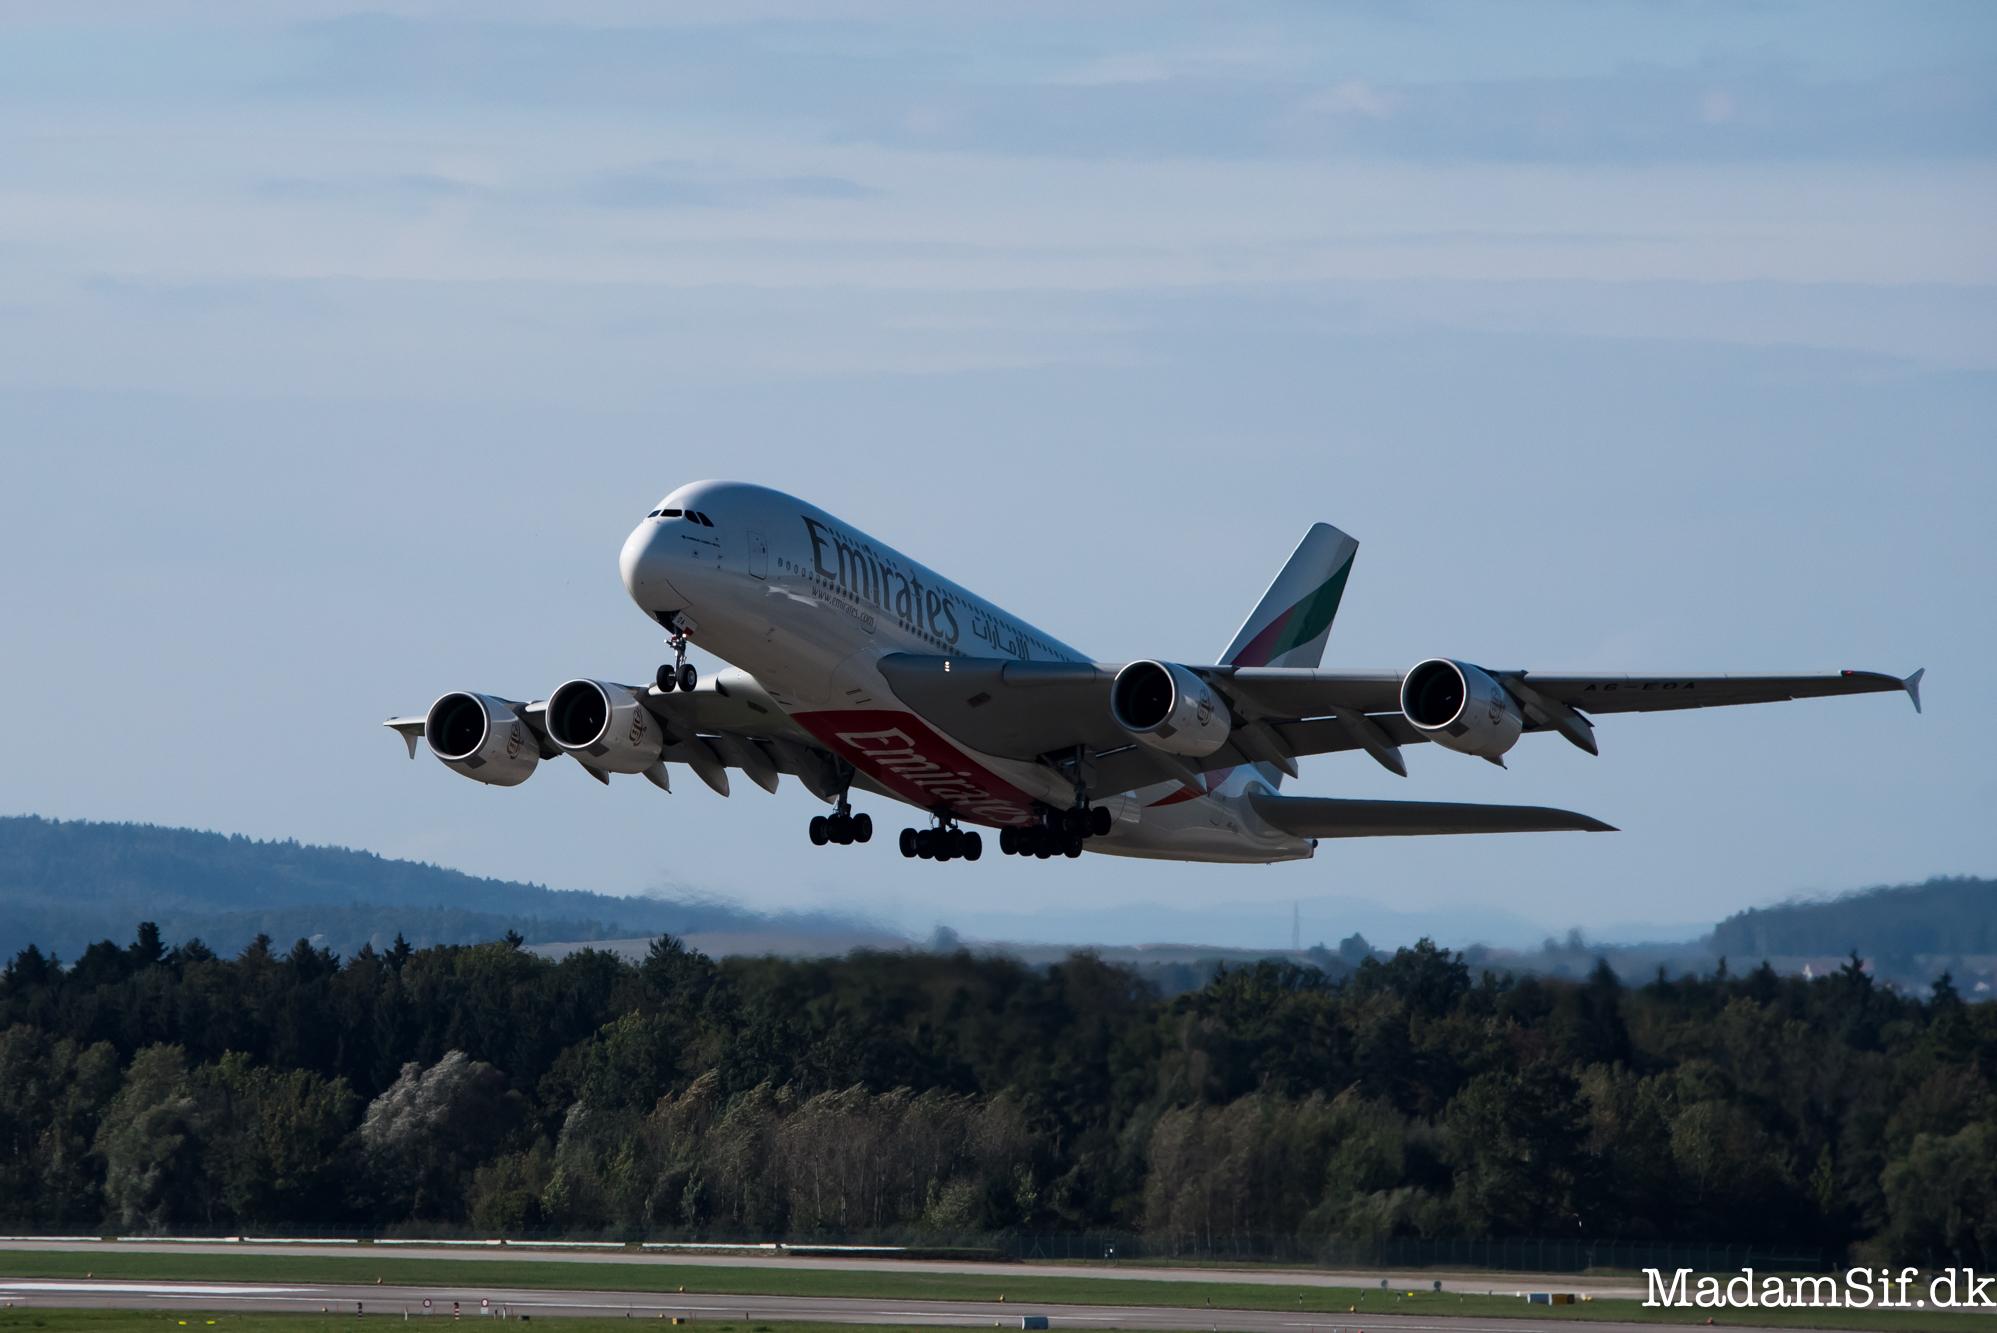 Airbus A380 er verdens største passagerfly. Halen alene er 14 meter høj!